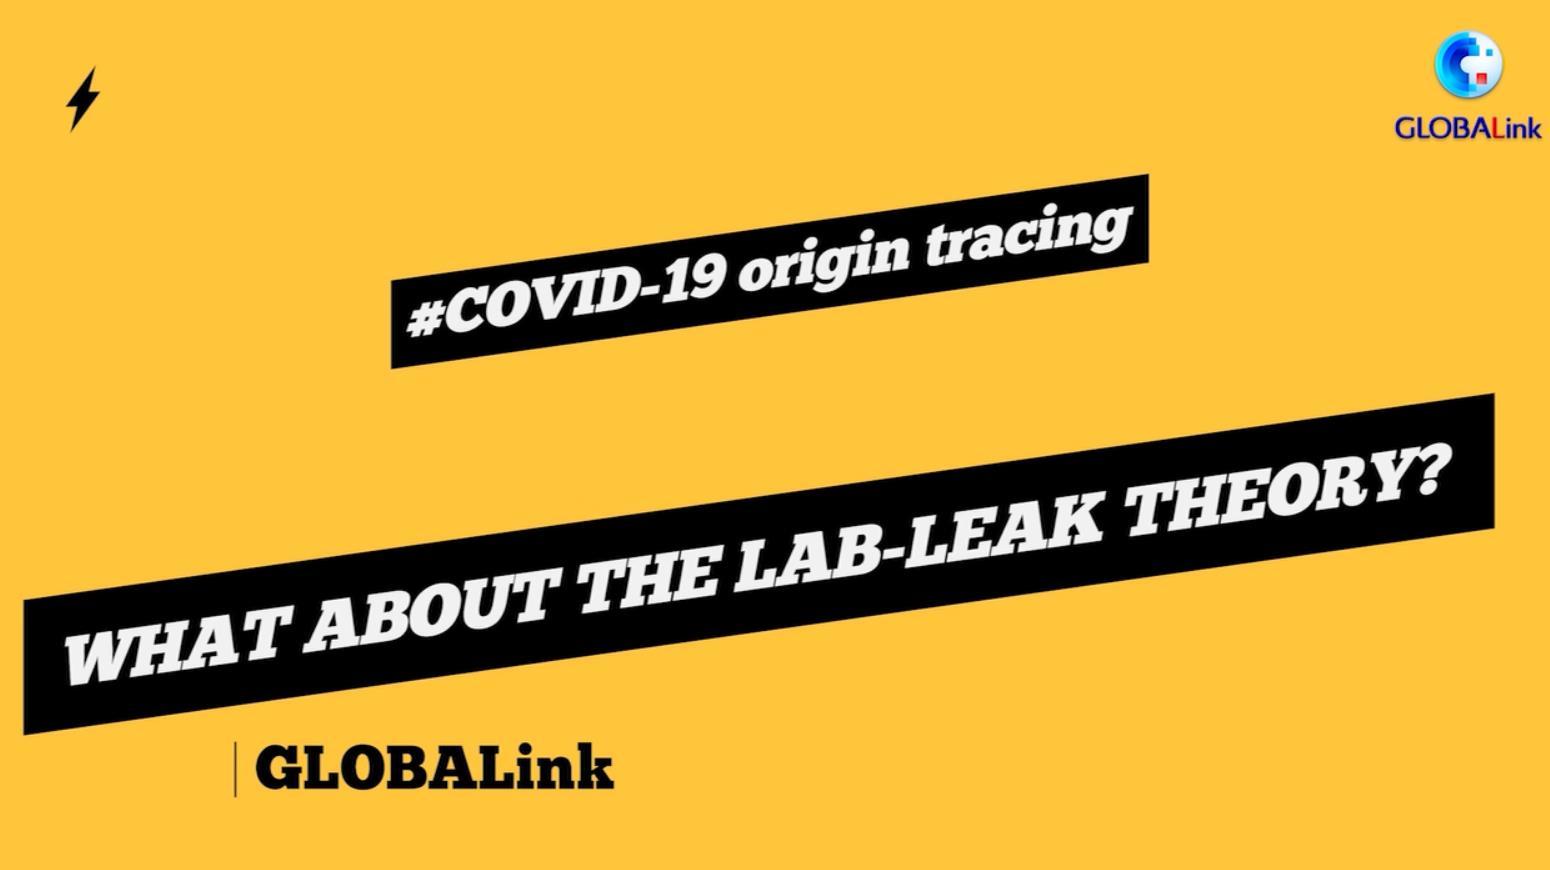 GLOBALink | Politicization jeopardizes COVID-19 origin tracing: UK virologist